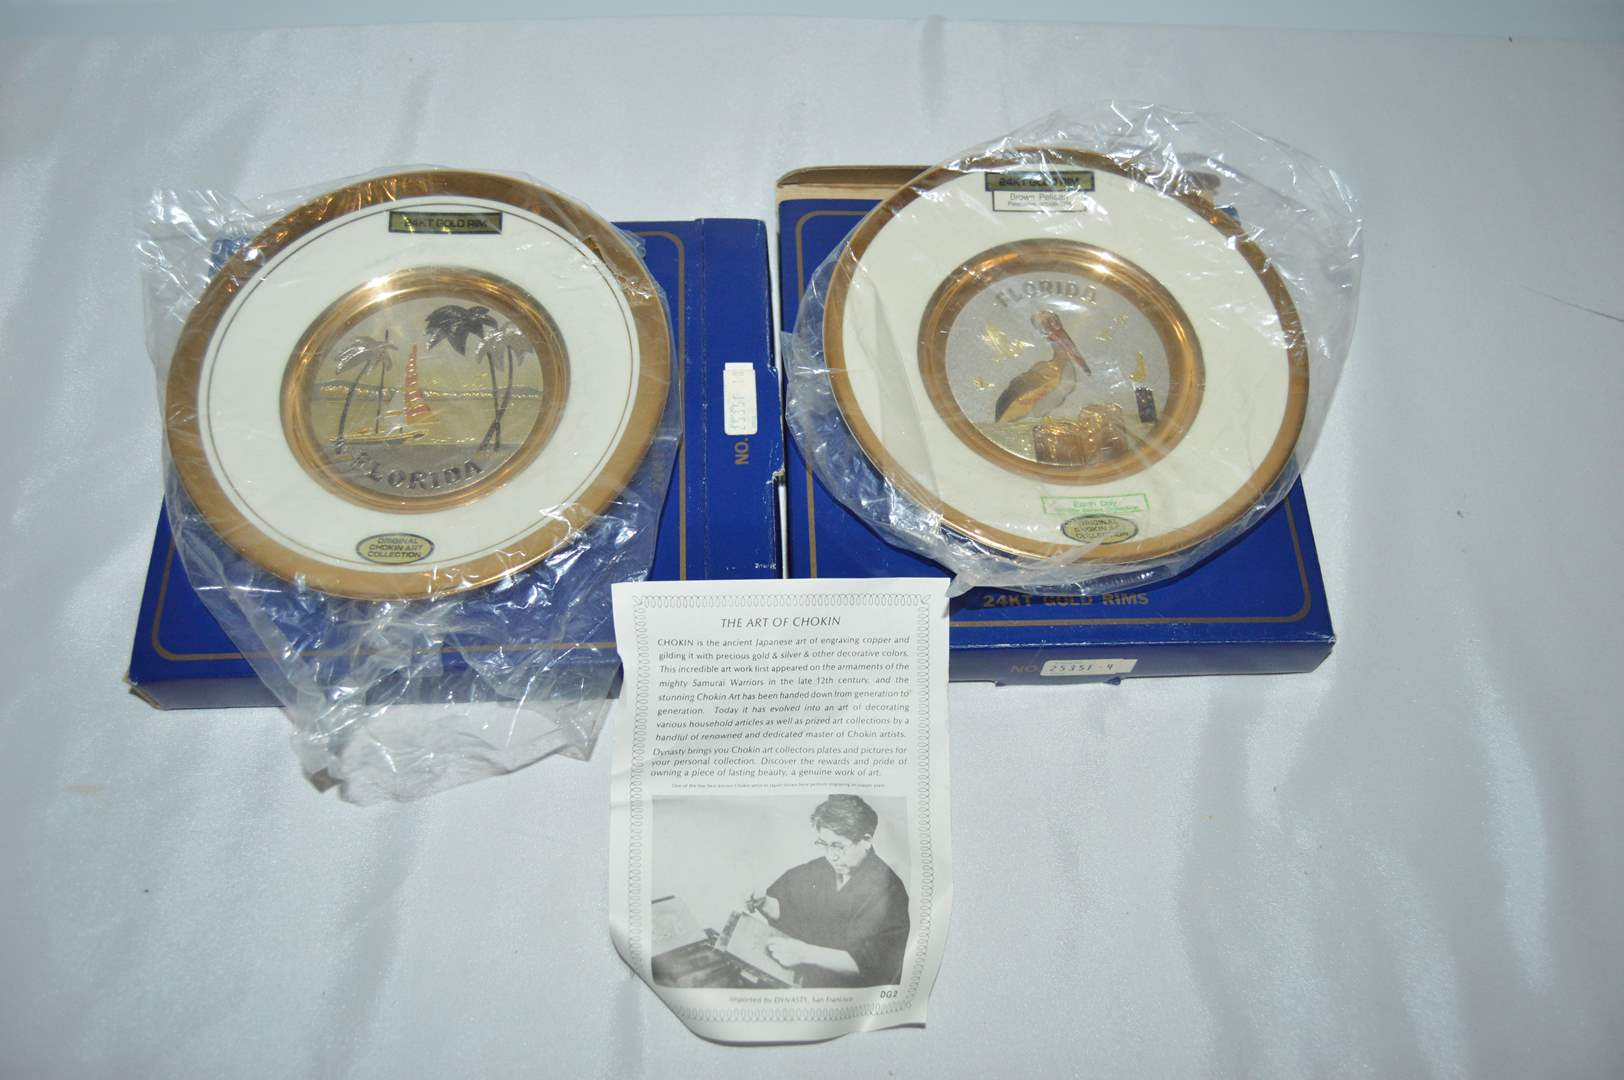 Lot # 143 2 Dynasty Gallery Chokin plates w/ boxes & paperwork - Florida & Brown Pelican (main image)